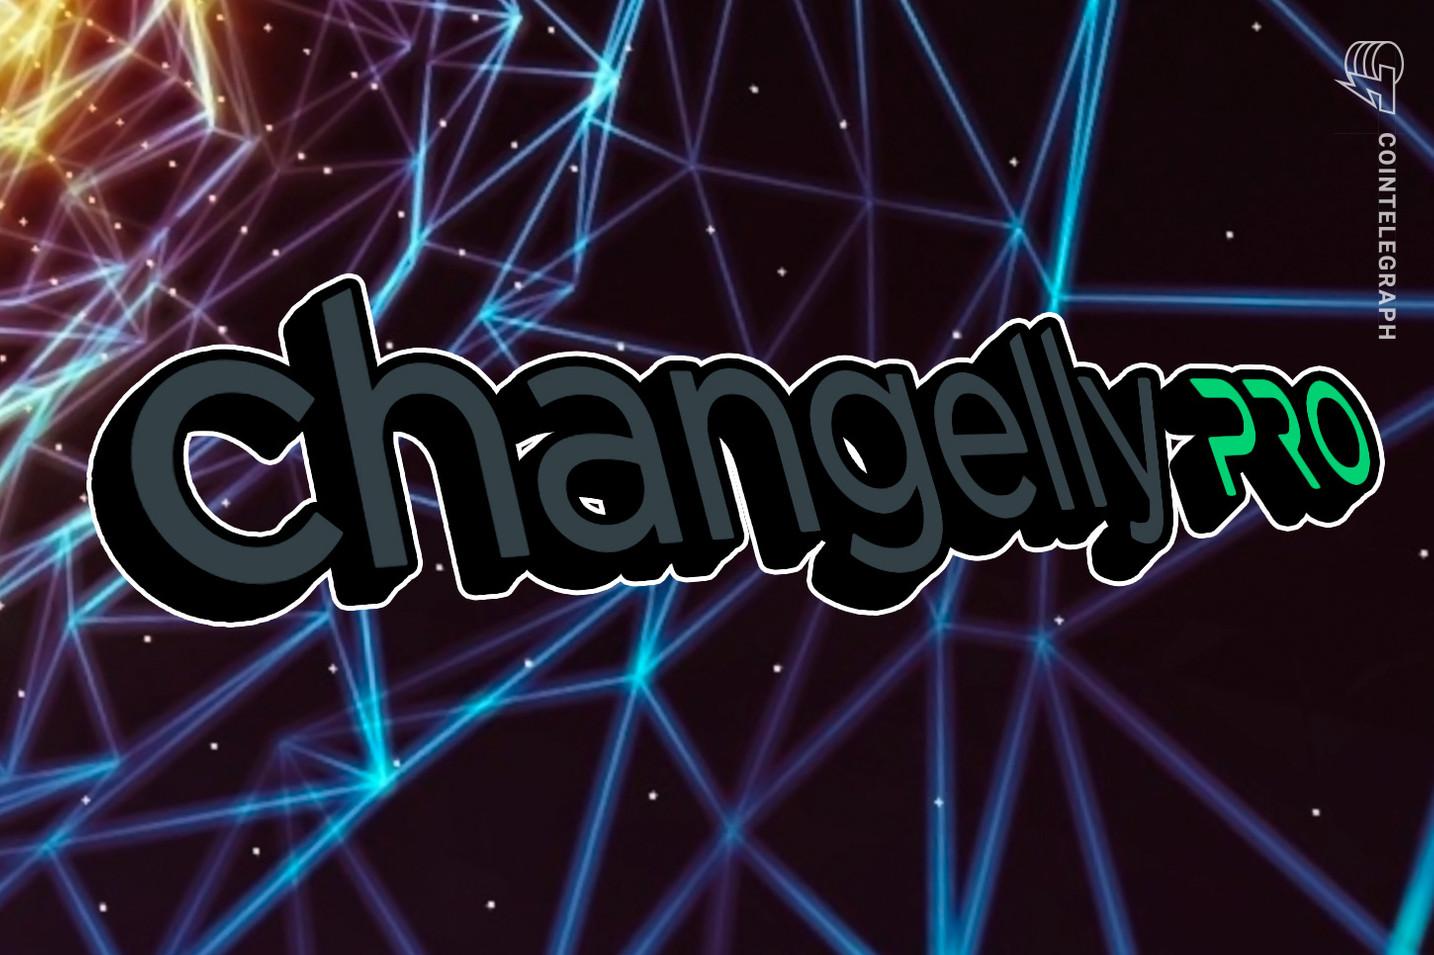 Changelly PRO welcomes SmartCash